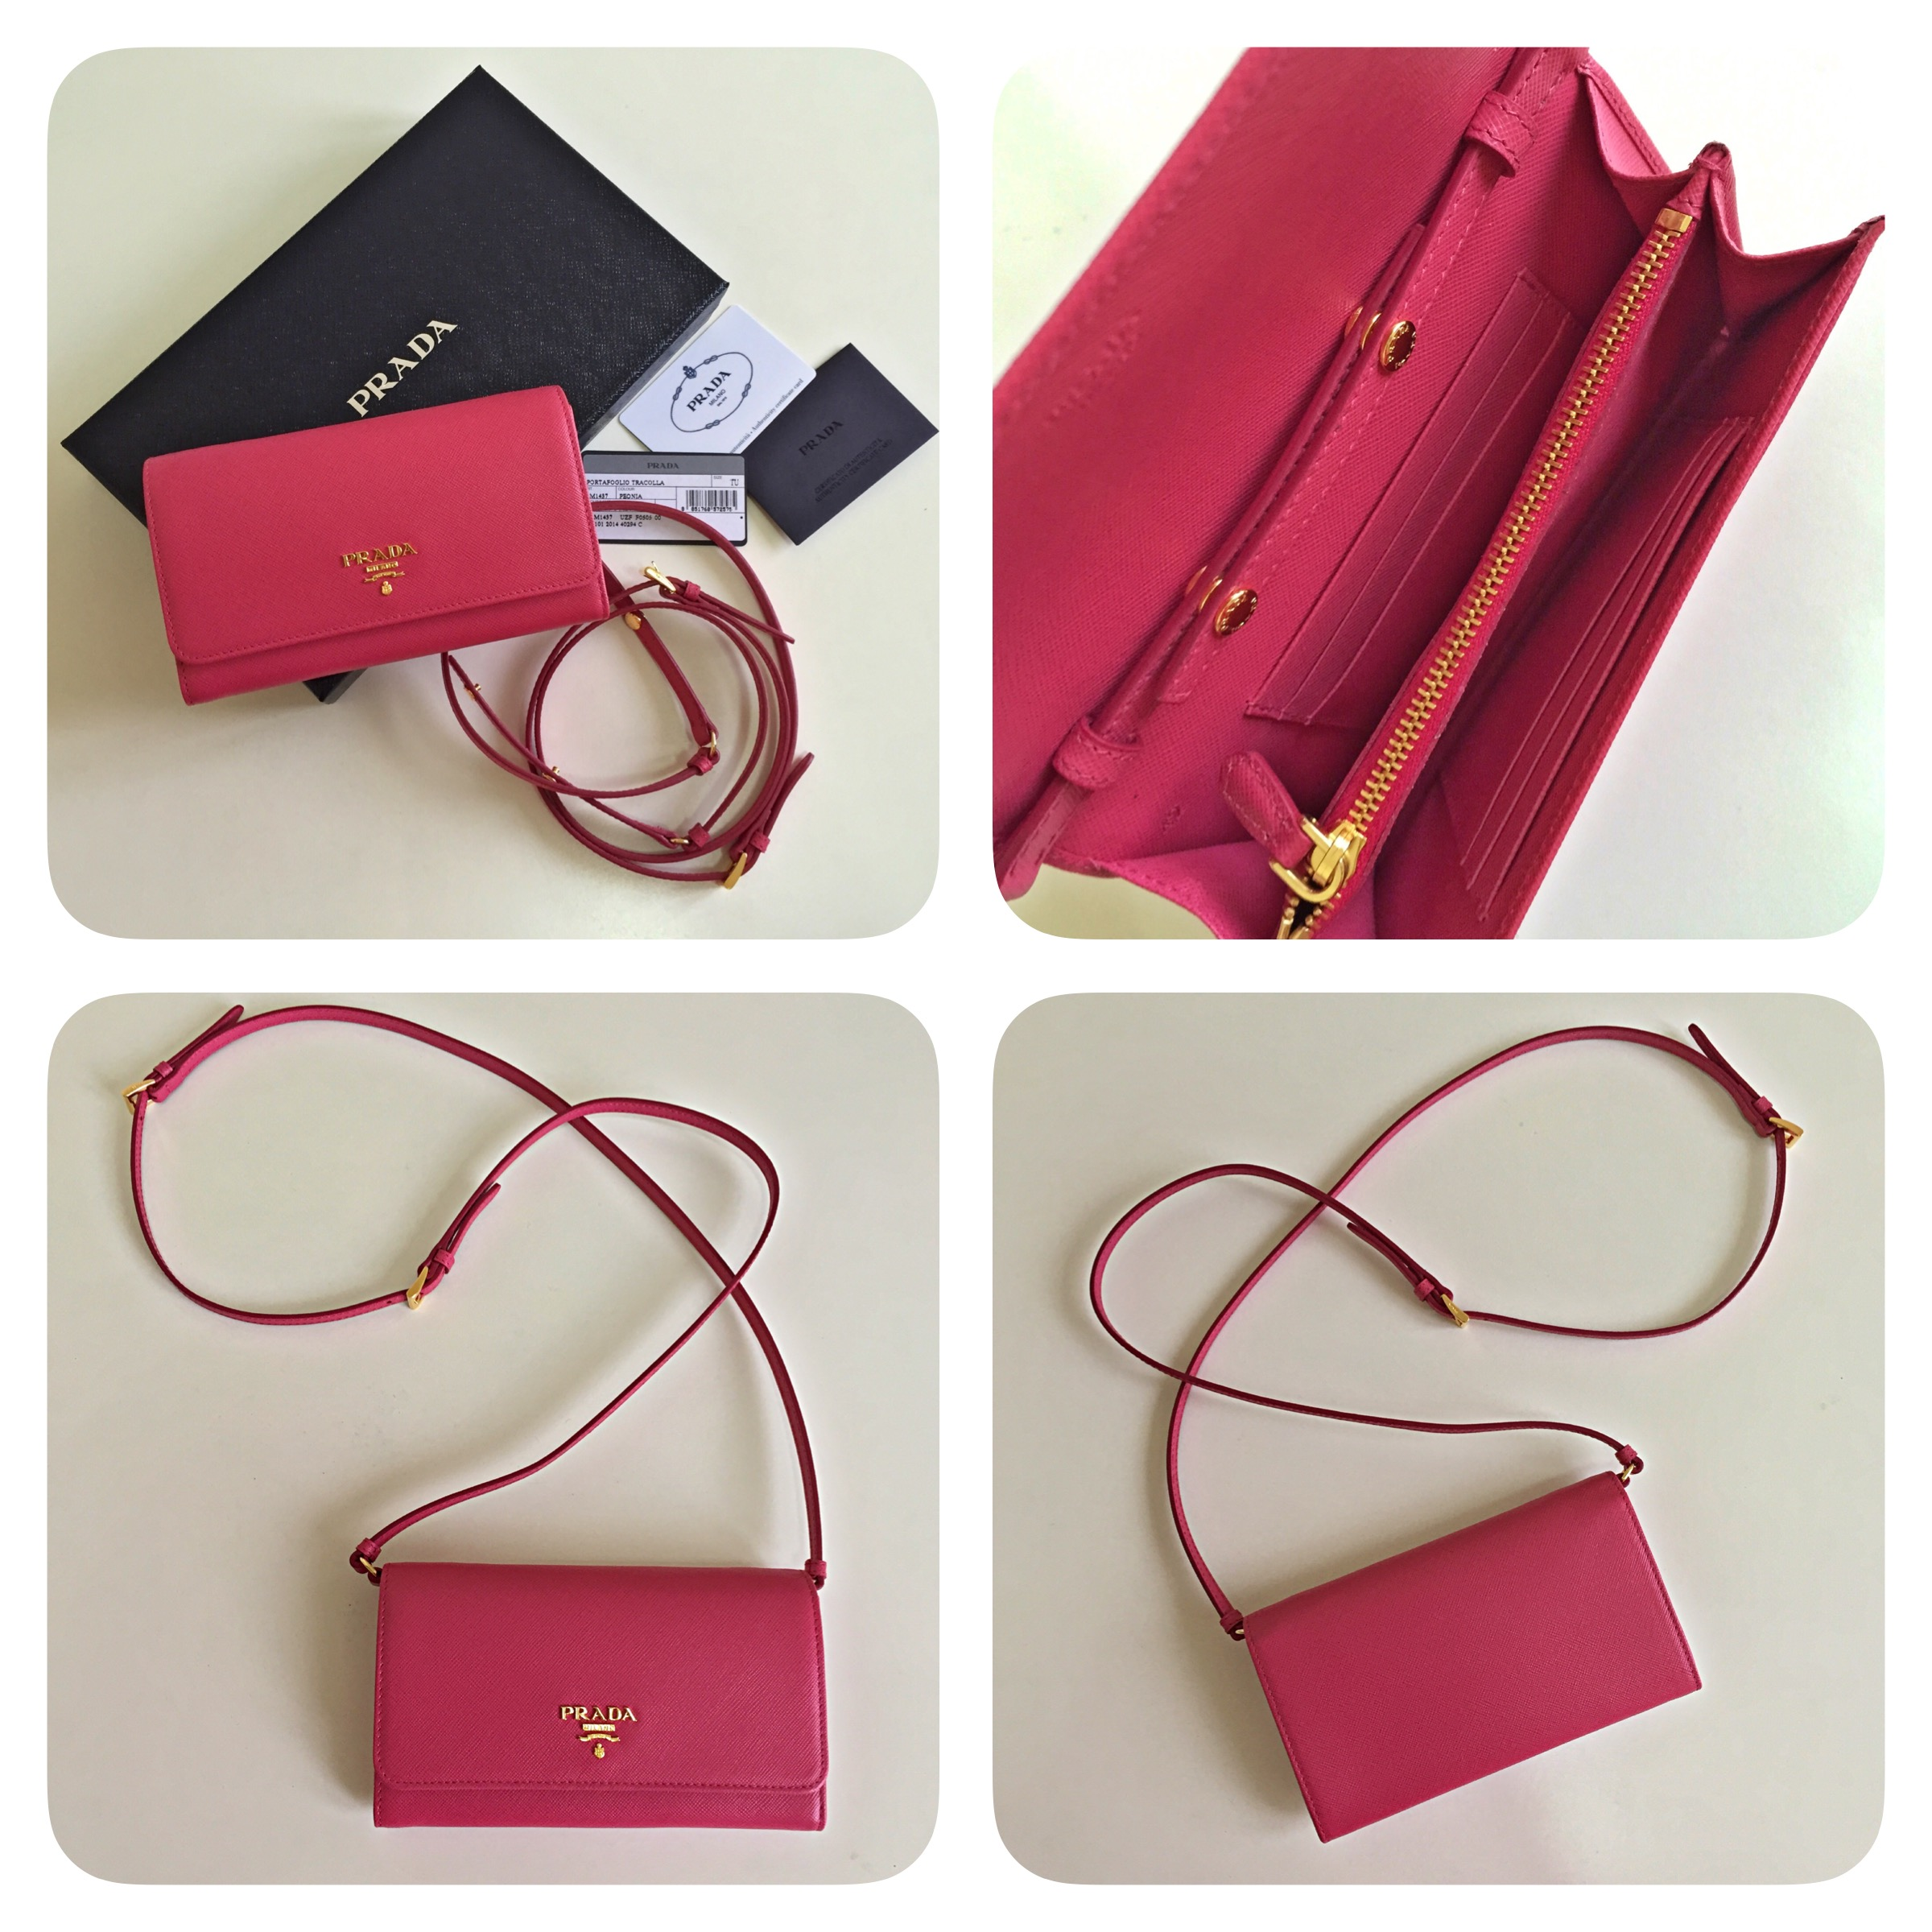 7c628bdf70cd ... discount prada saffiano metal peonia mini crossbody bag on storenvy  bef6d 3eb93 ...